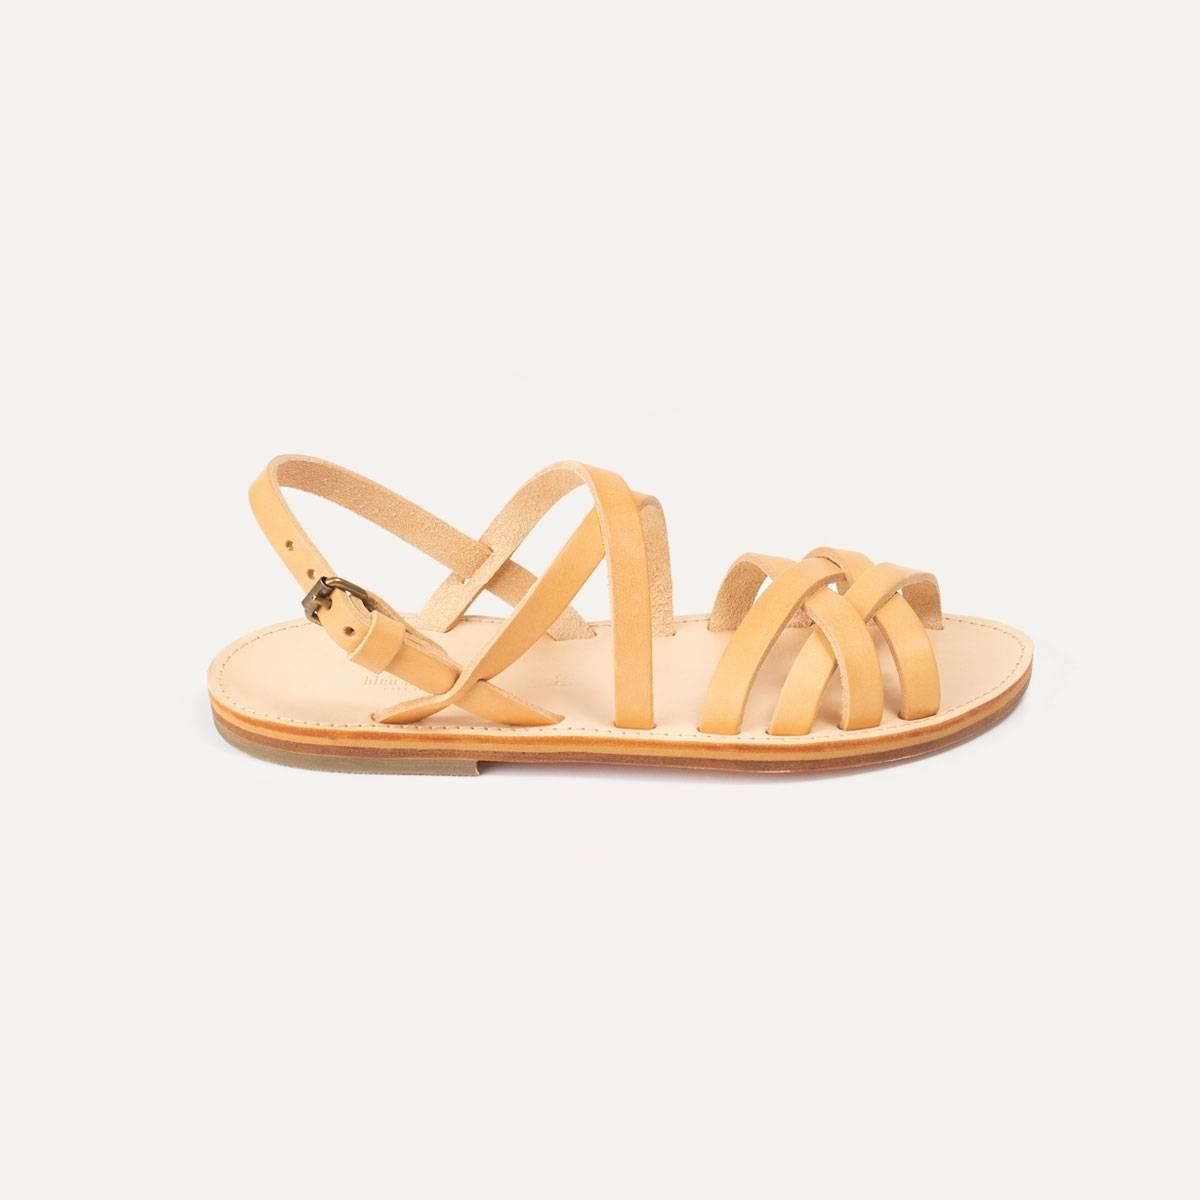 Sandales cuir Majour - Naturel (image n°5)